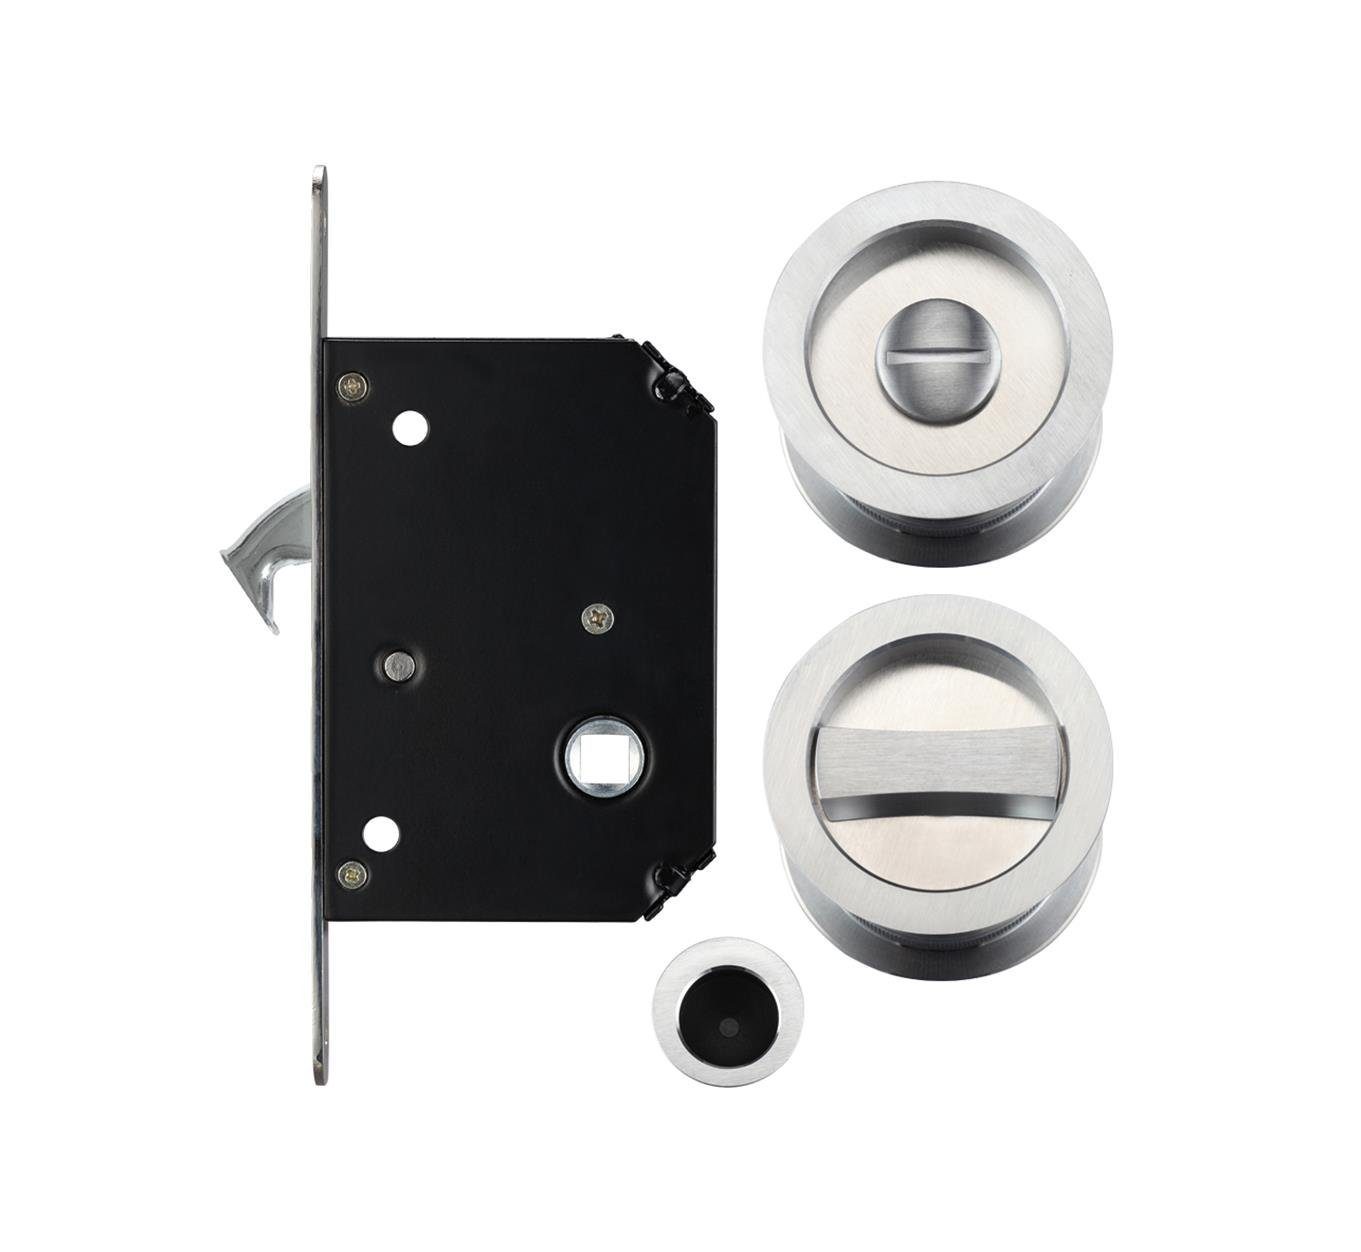 Sliding Pocket Door Bathroom Privacy Lock Set (Polished Chrome) Zoo UKASNHKTN7880